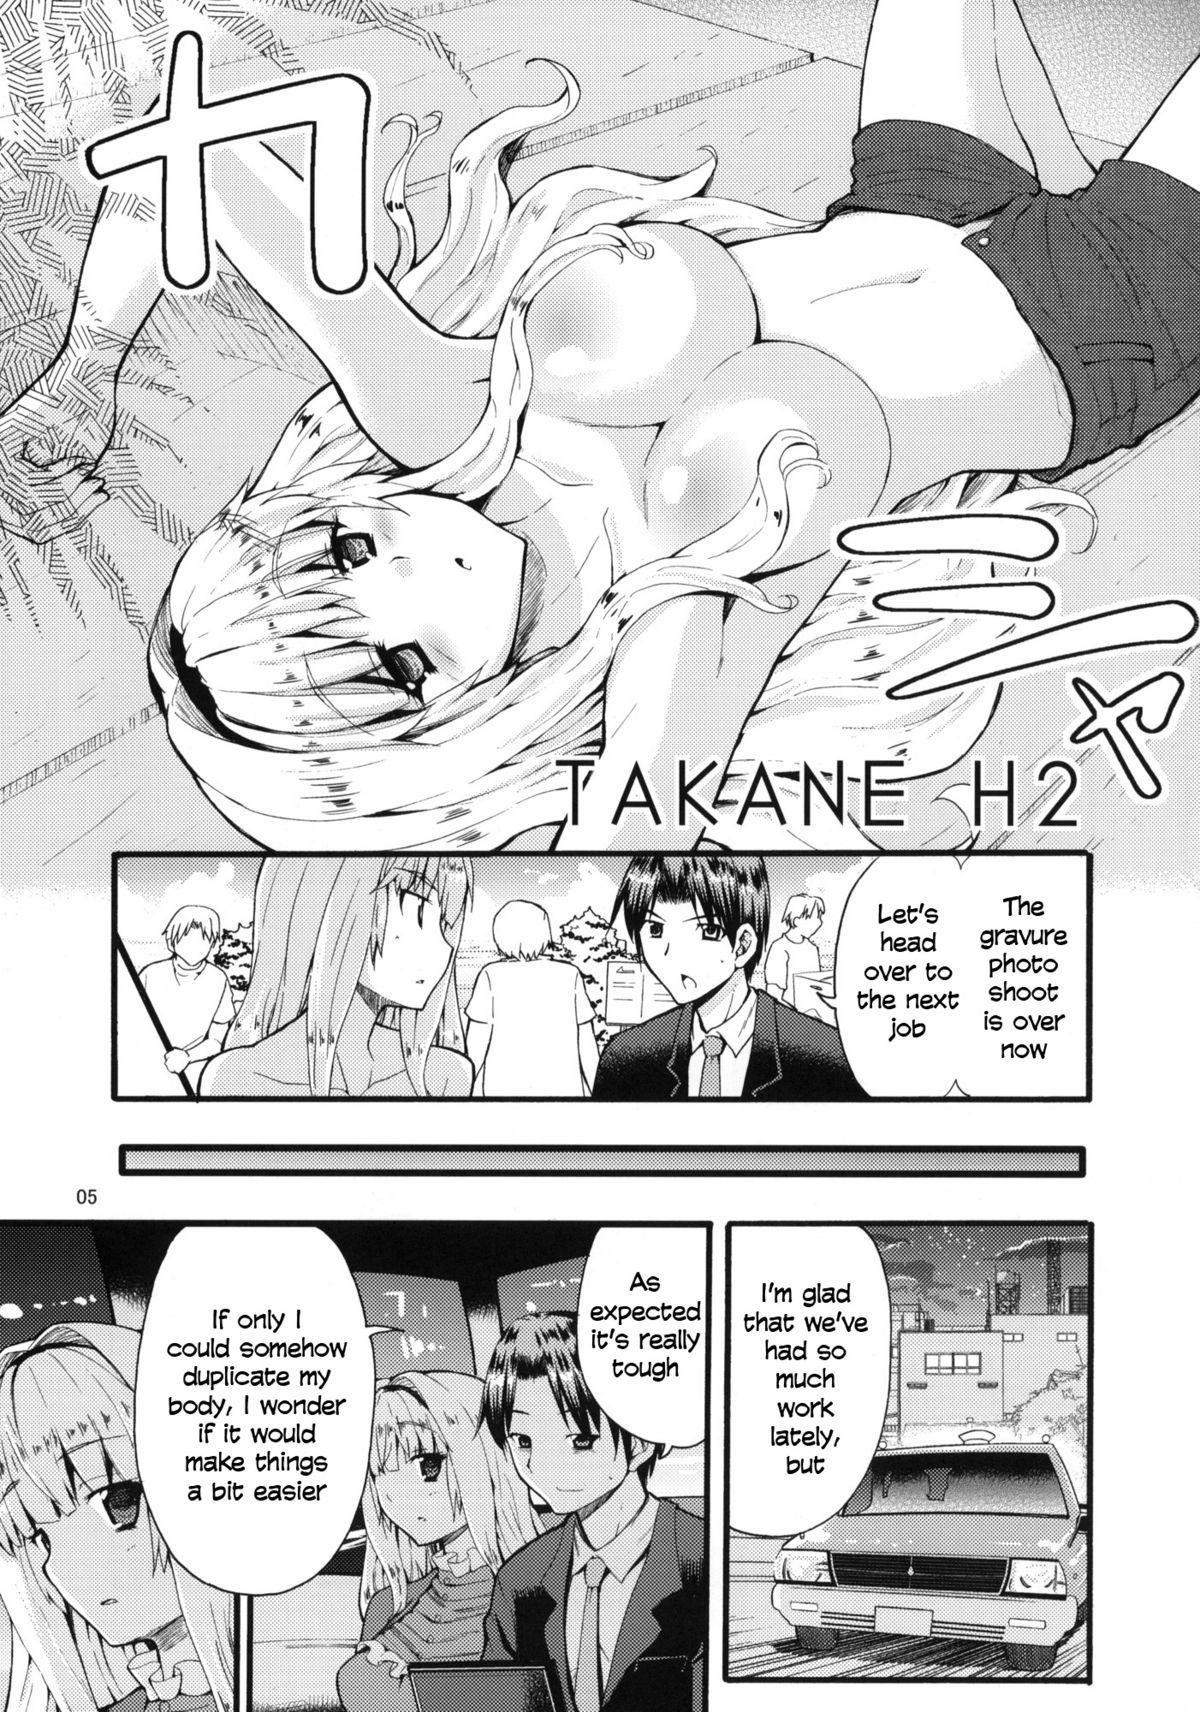 TAKANE H2 3